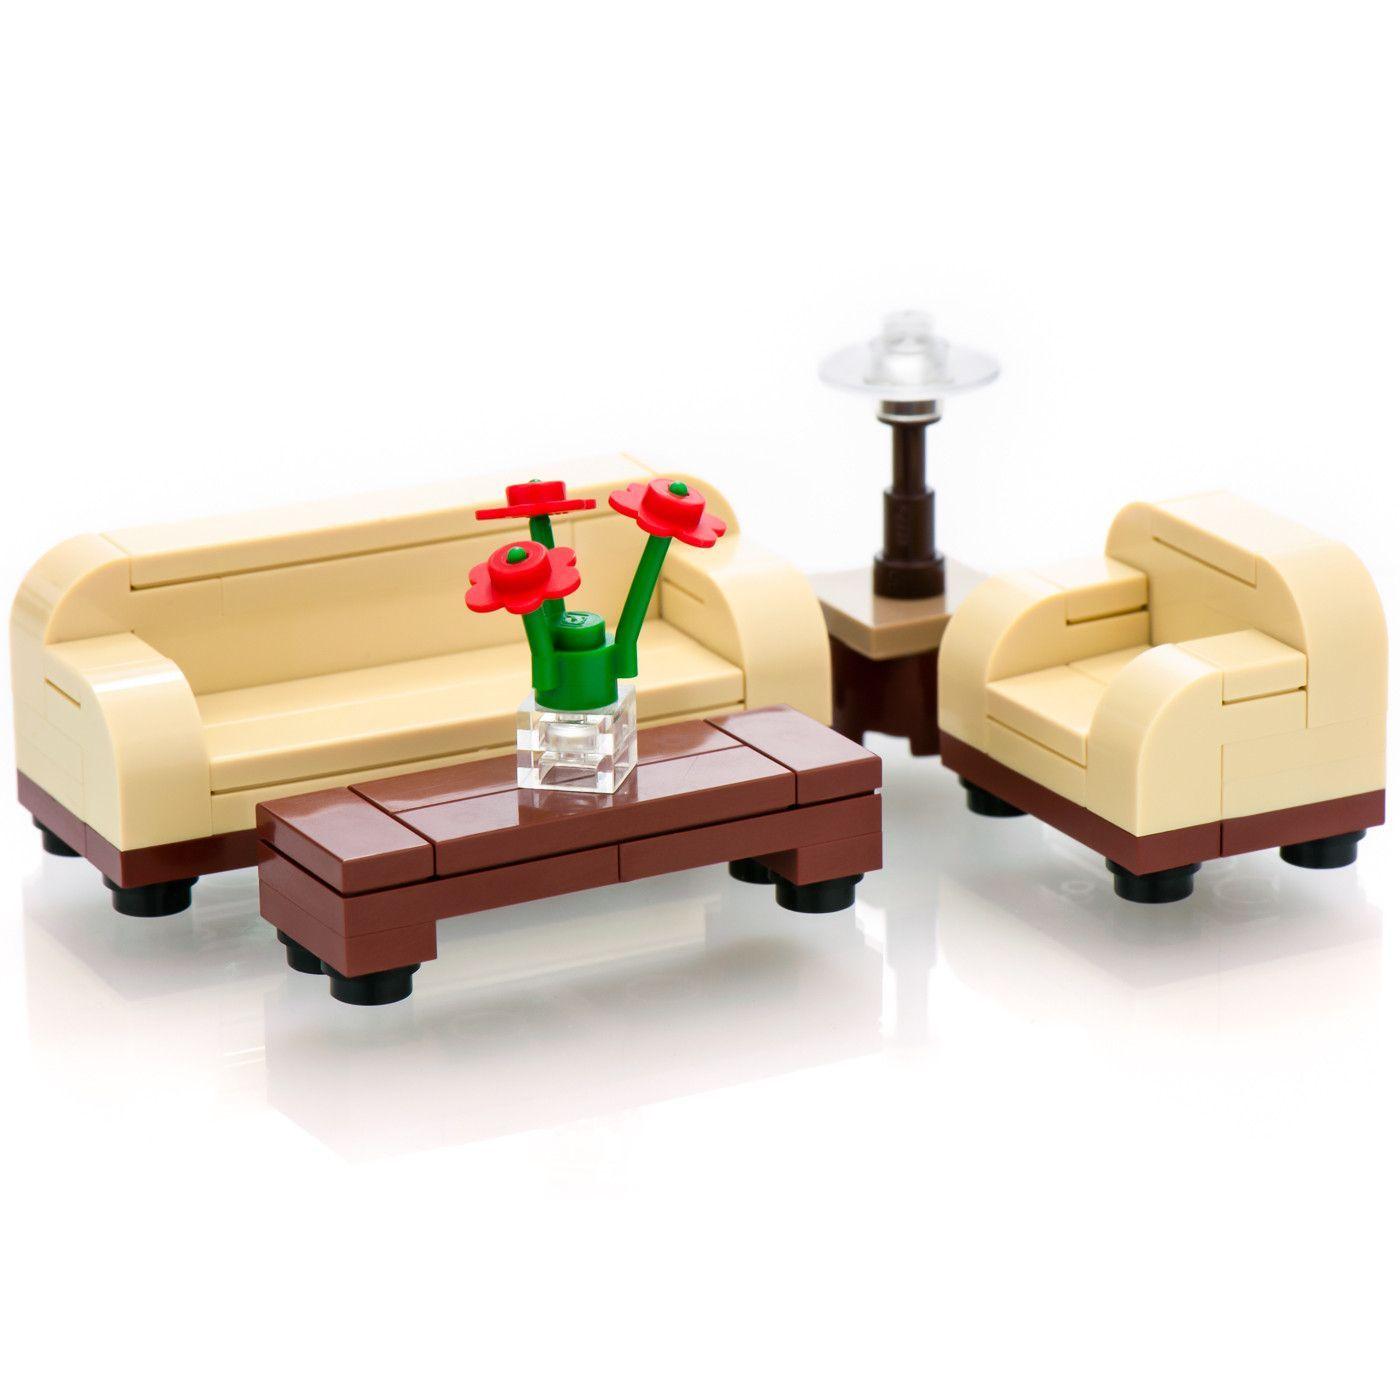 Lego Furniture Custom Legoar Furniture Toy Living Room Set Lego Furniture